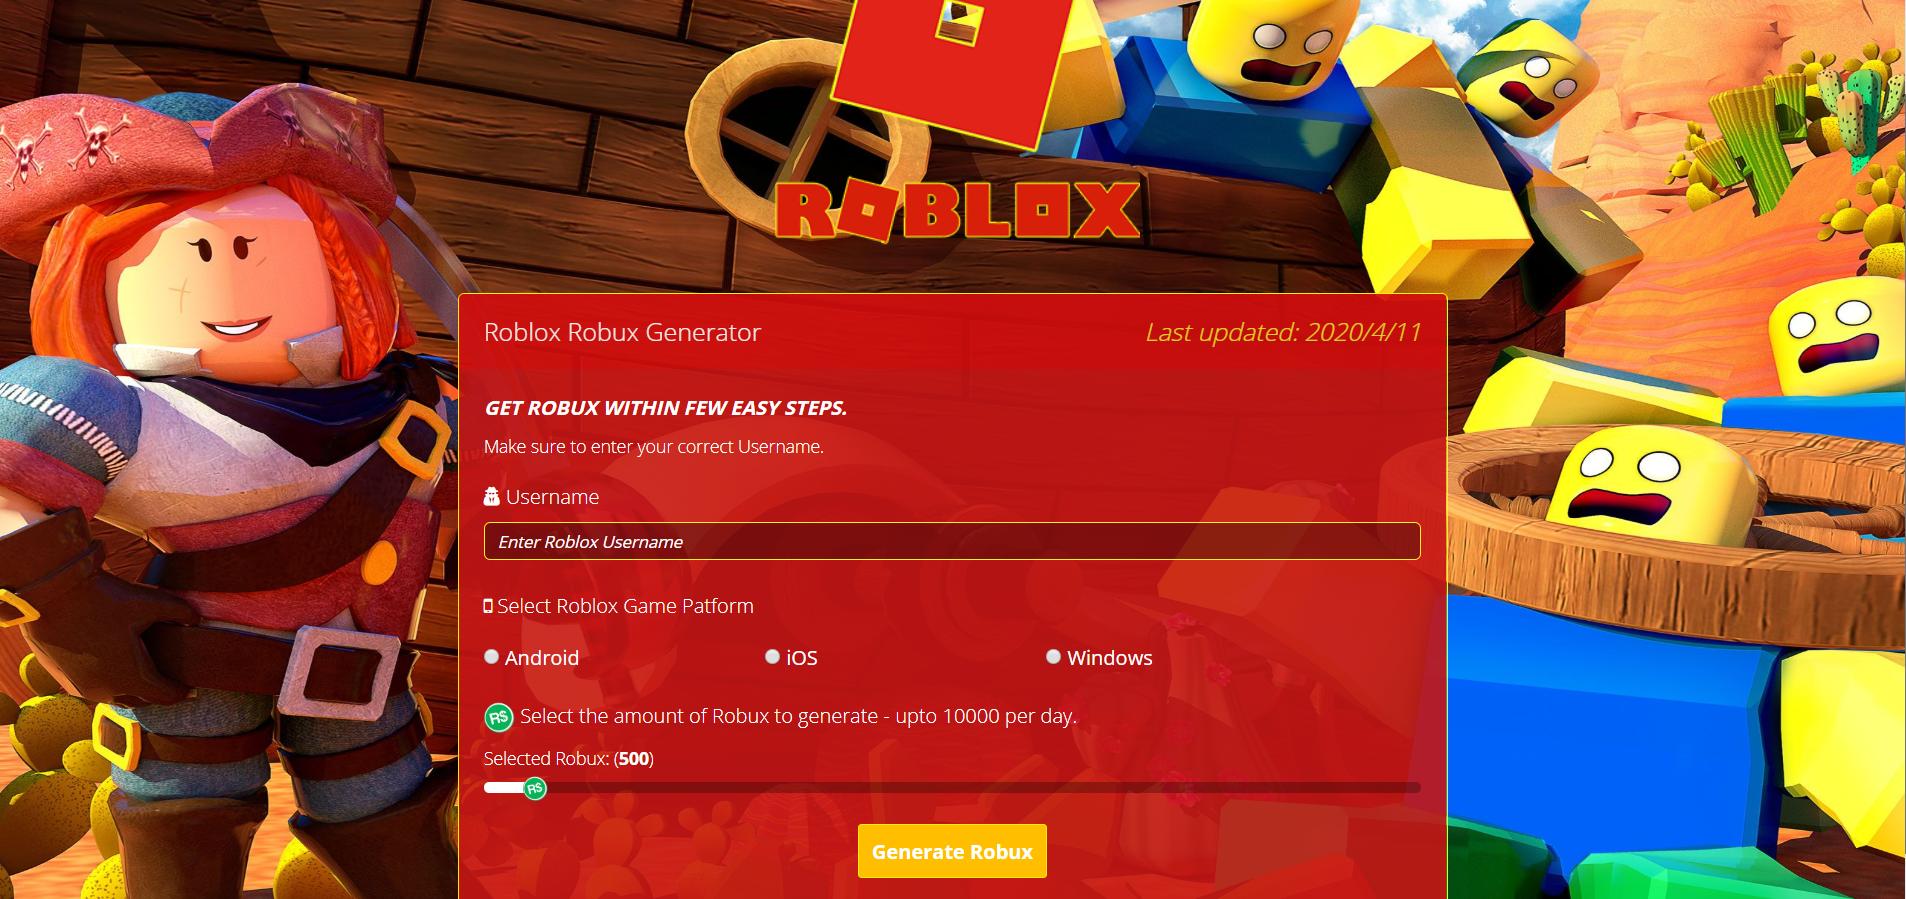 Roblox Hack Robux 2020 Roblox Roblox Roblox Roblox Generator